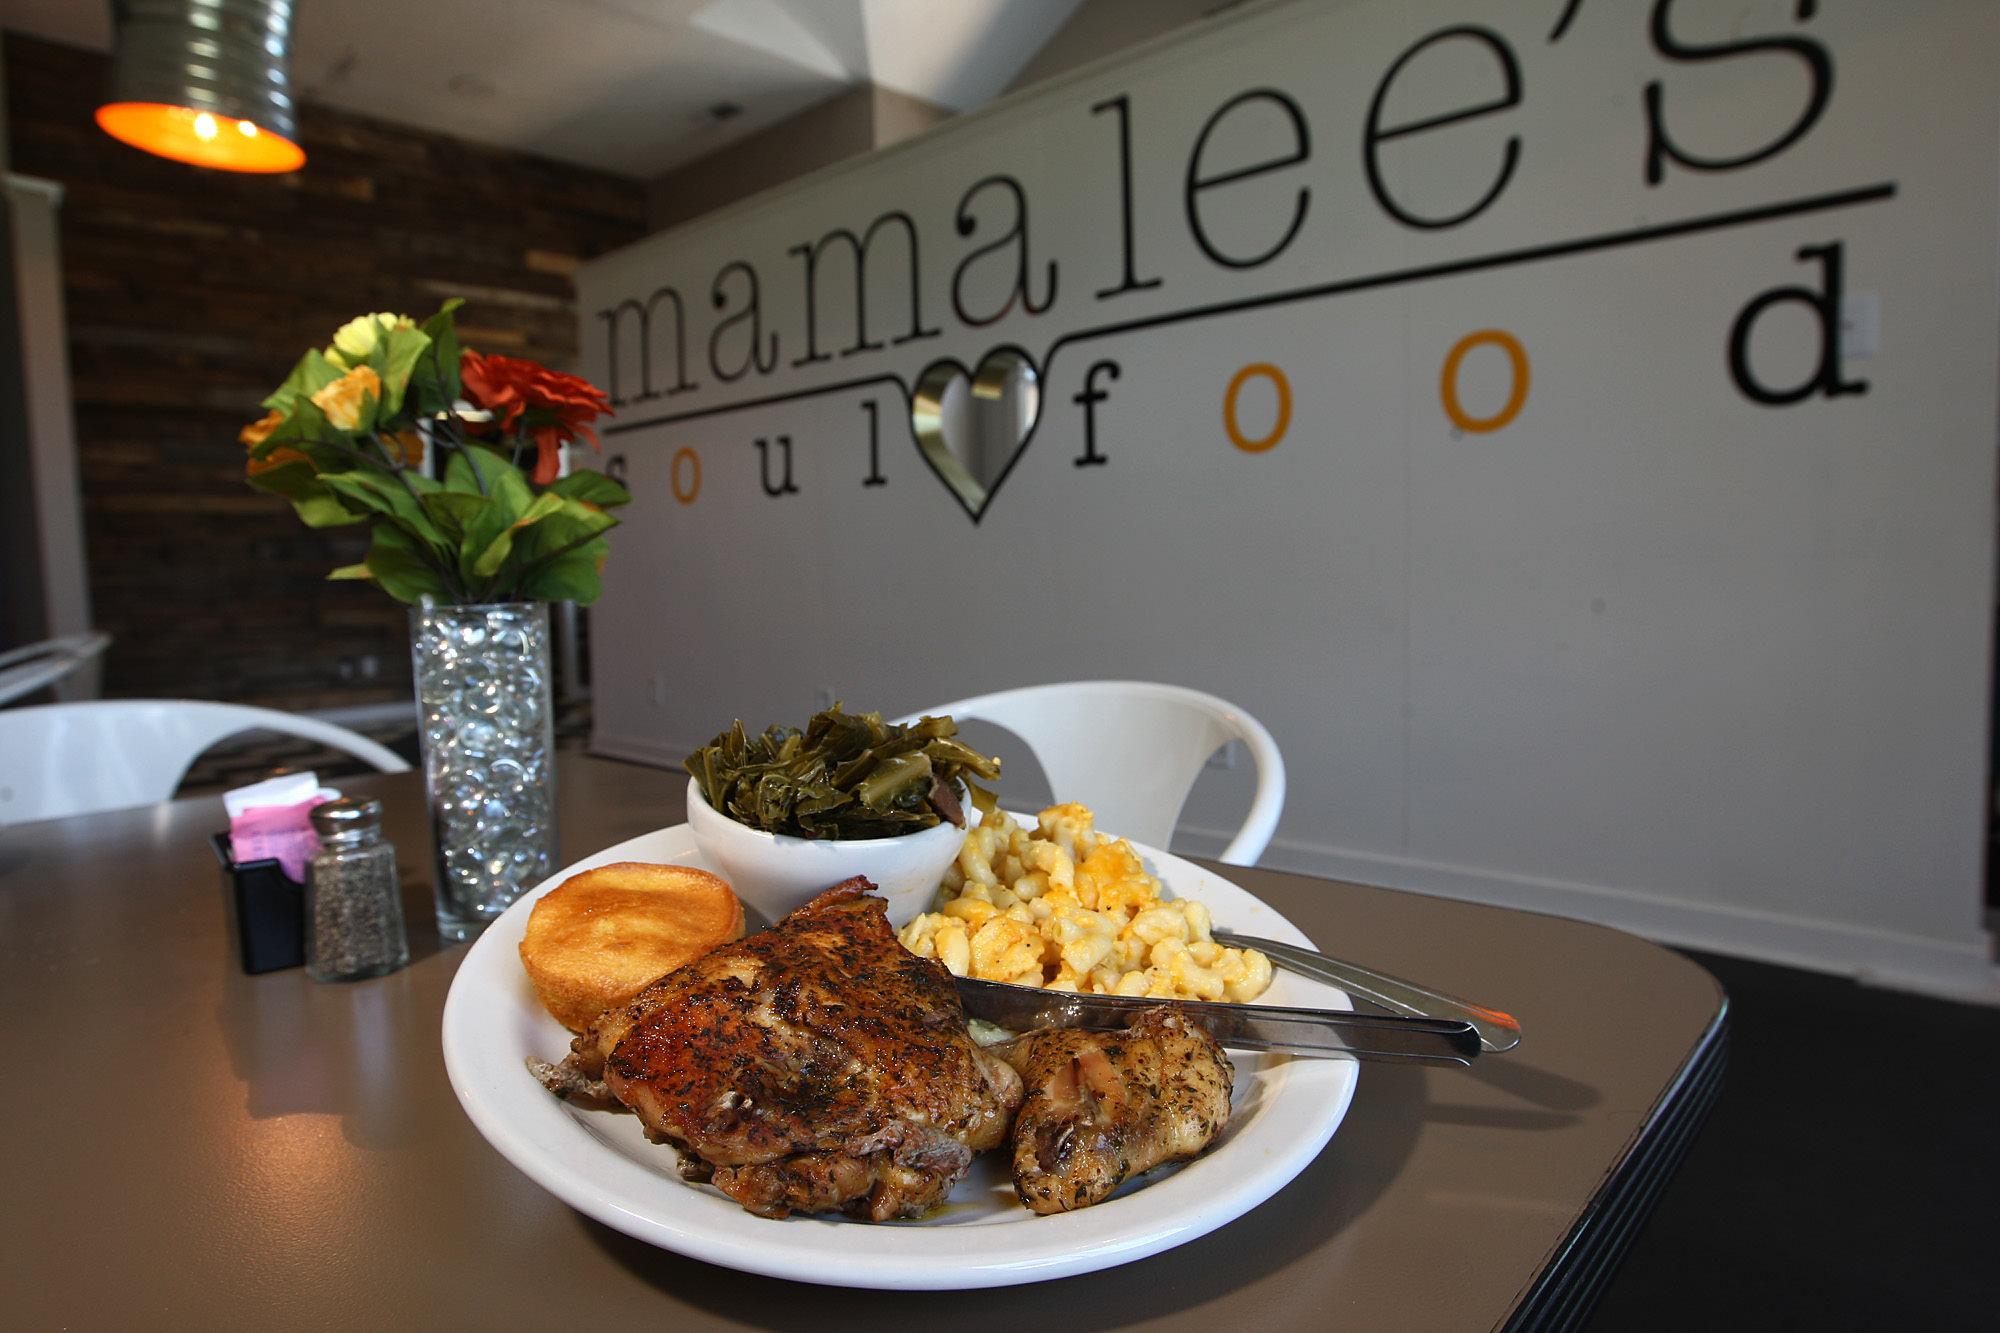 Pleasing Front Mama Tv Fame Closes San Antonio Restaurant Impossible Update Ummat Cafe Restaurant Impossible Updates Country Cow nice food Restaurant Impossible Updates